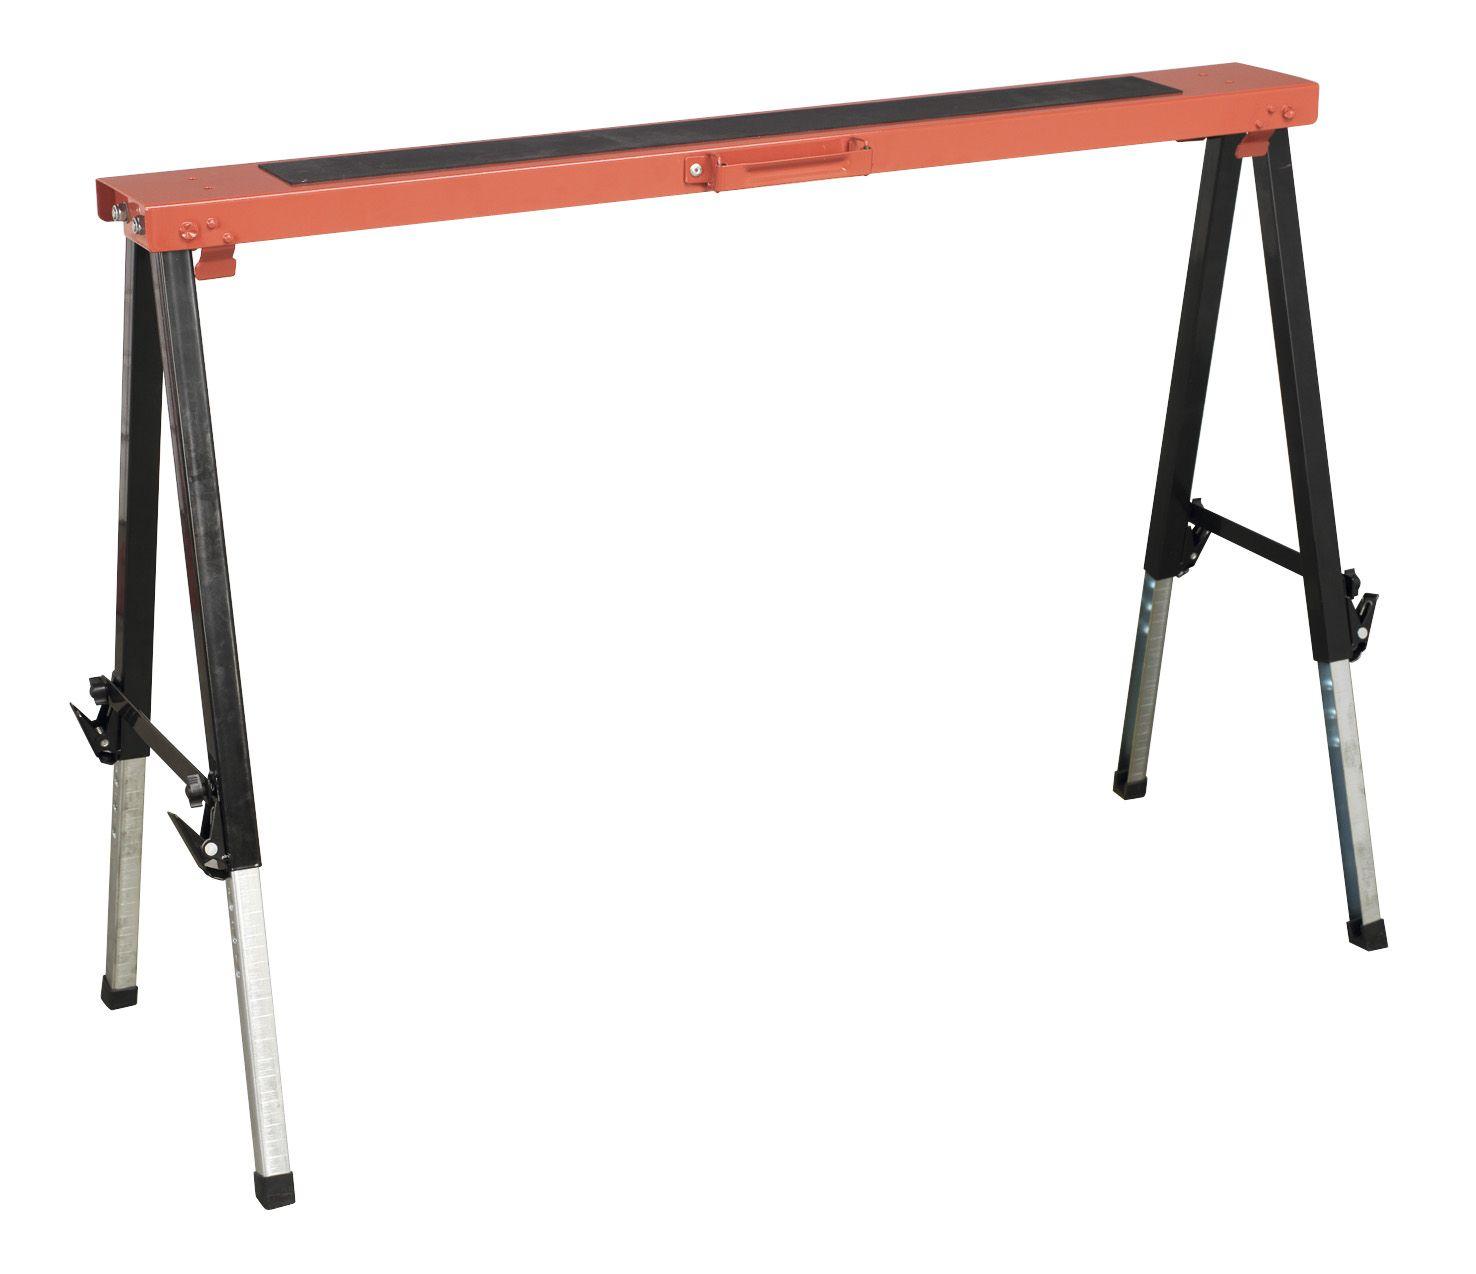 Sealey Fold Down Trestle Adjustable Legs 150kg Capacity